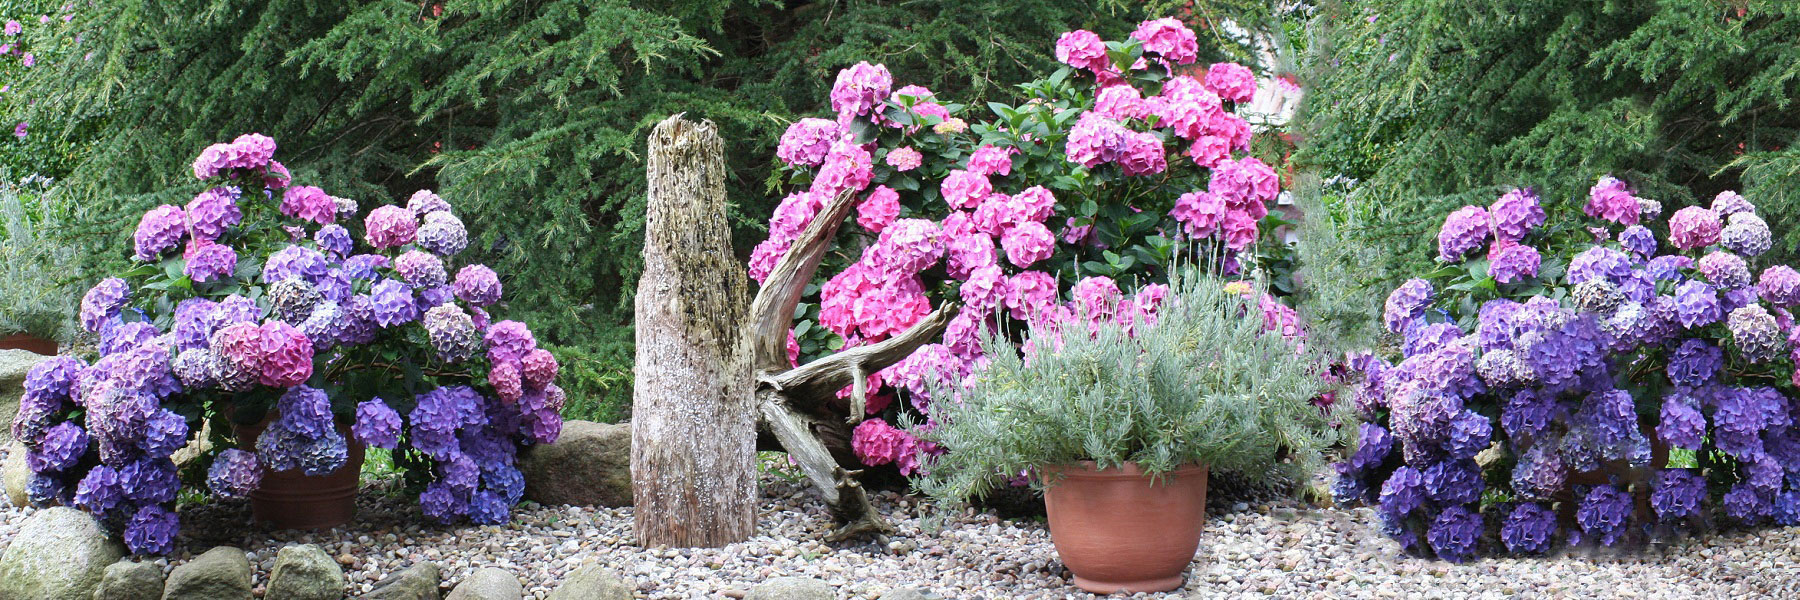 Blumen - Natur-Schatzkammer Neuheide